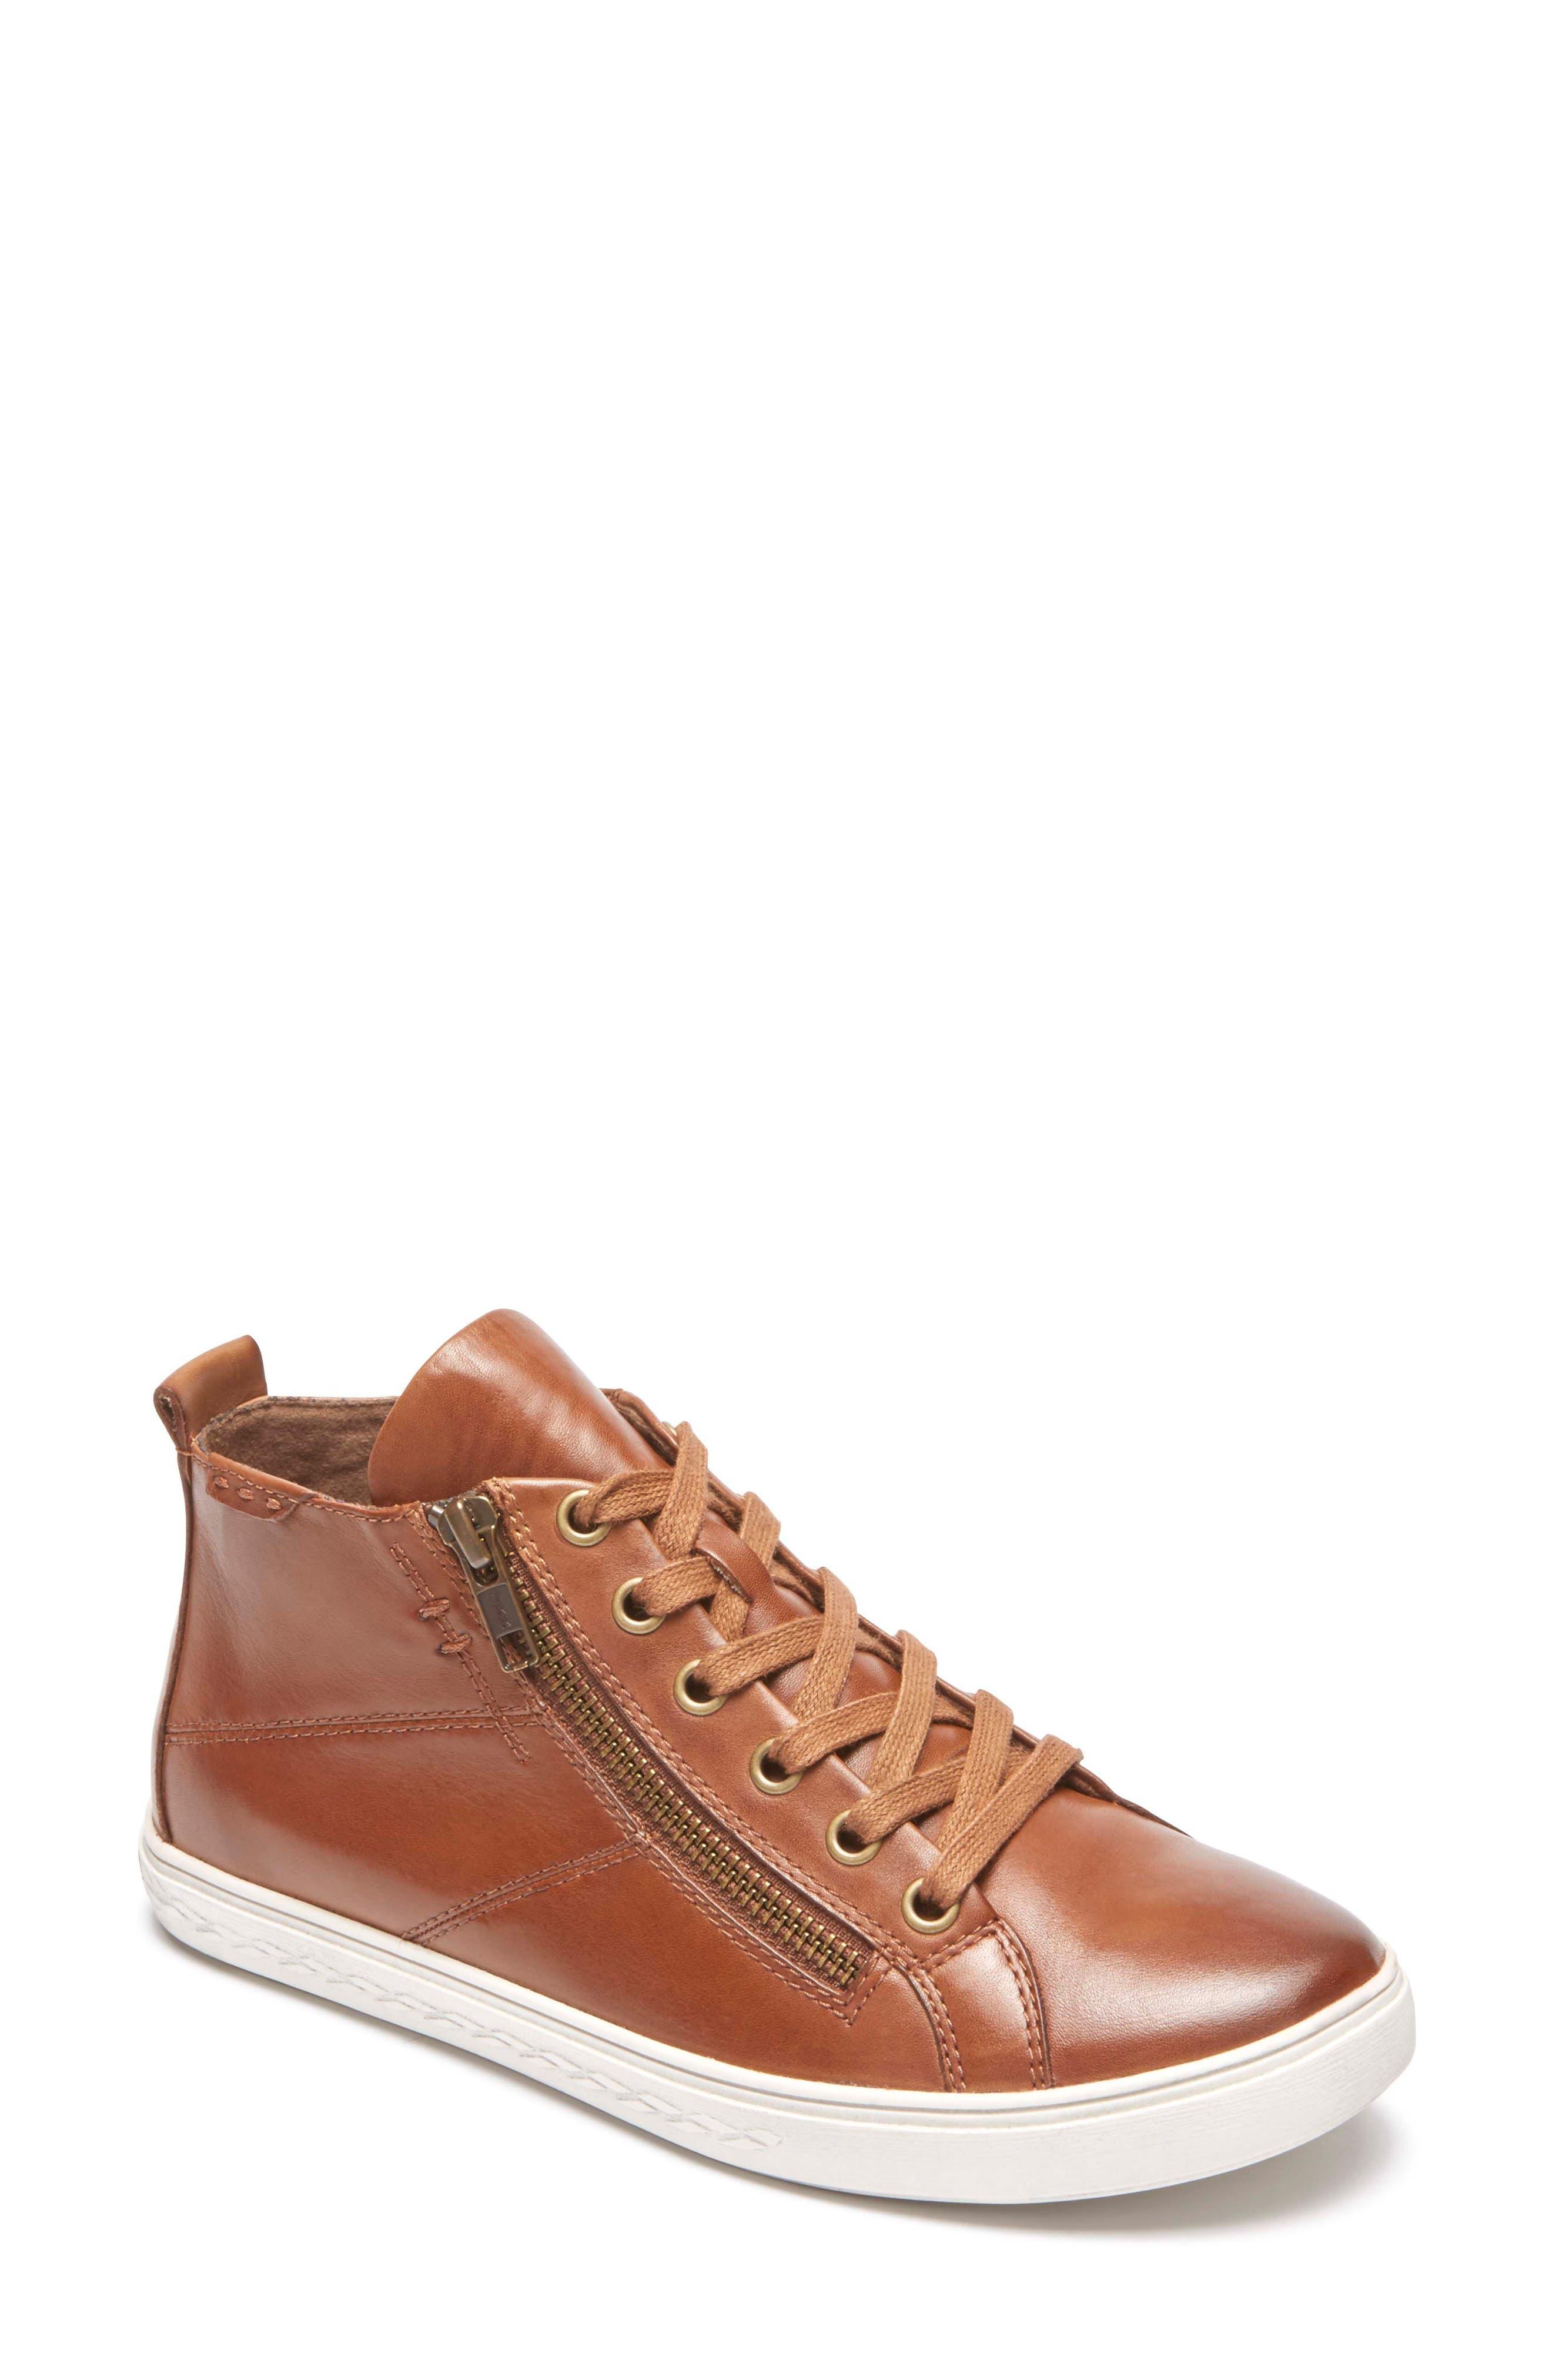 Rockport Cobb Hill Willa High Top Sneaker- Brown